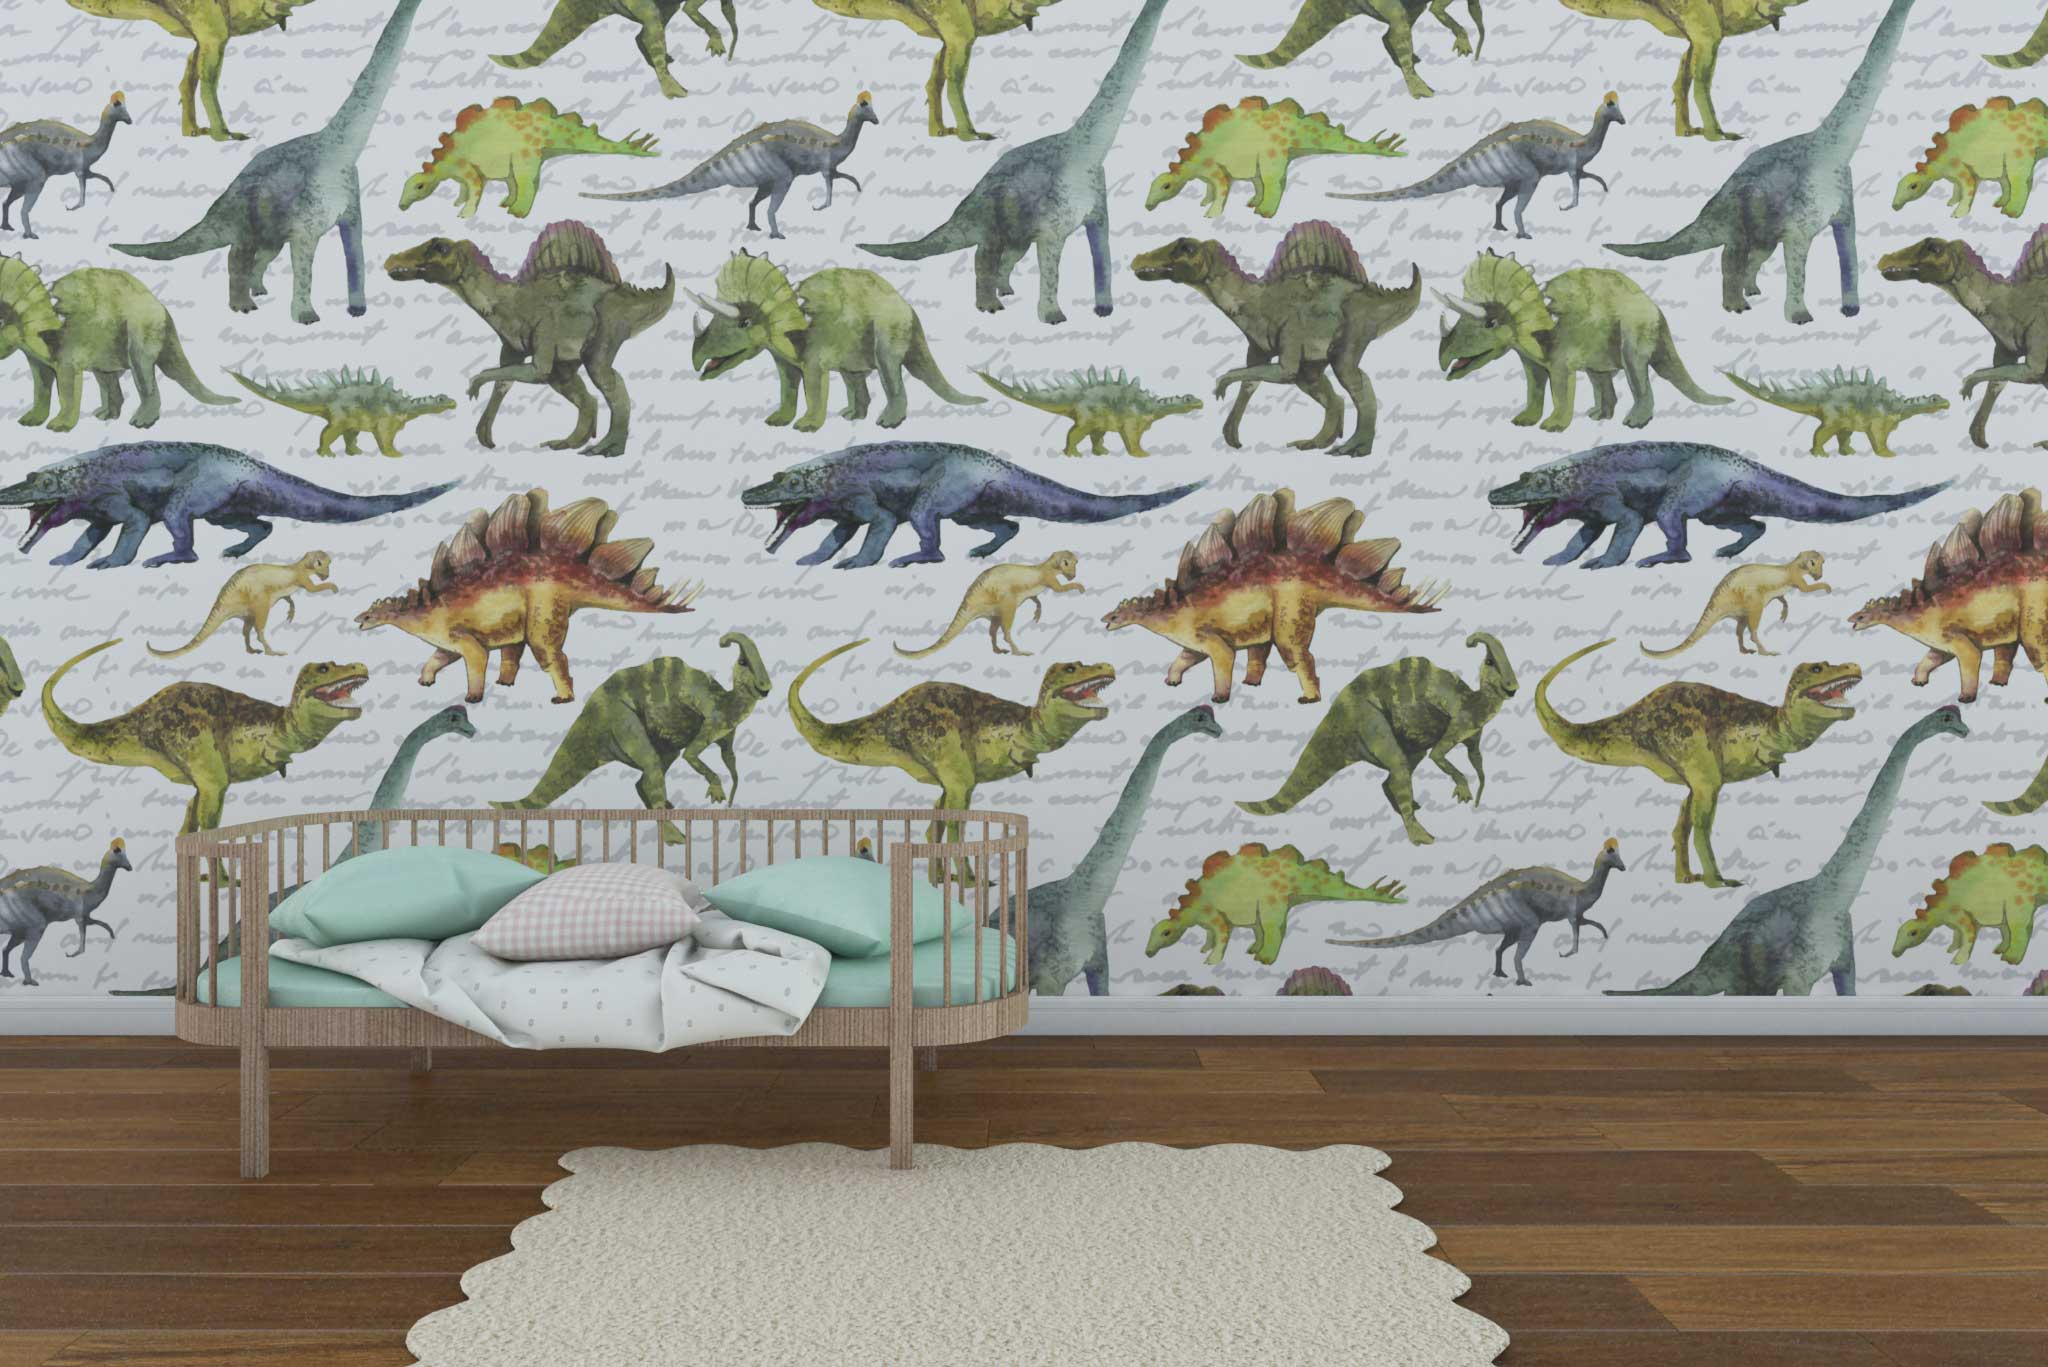 tapet-fototapet-comanda-personalizat-bucuresti-camera-dormitor-copii-model-desen-dinozauri-acuarela